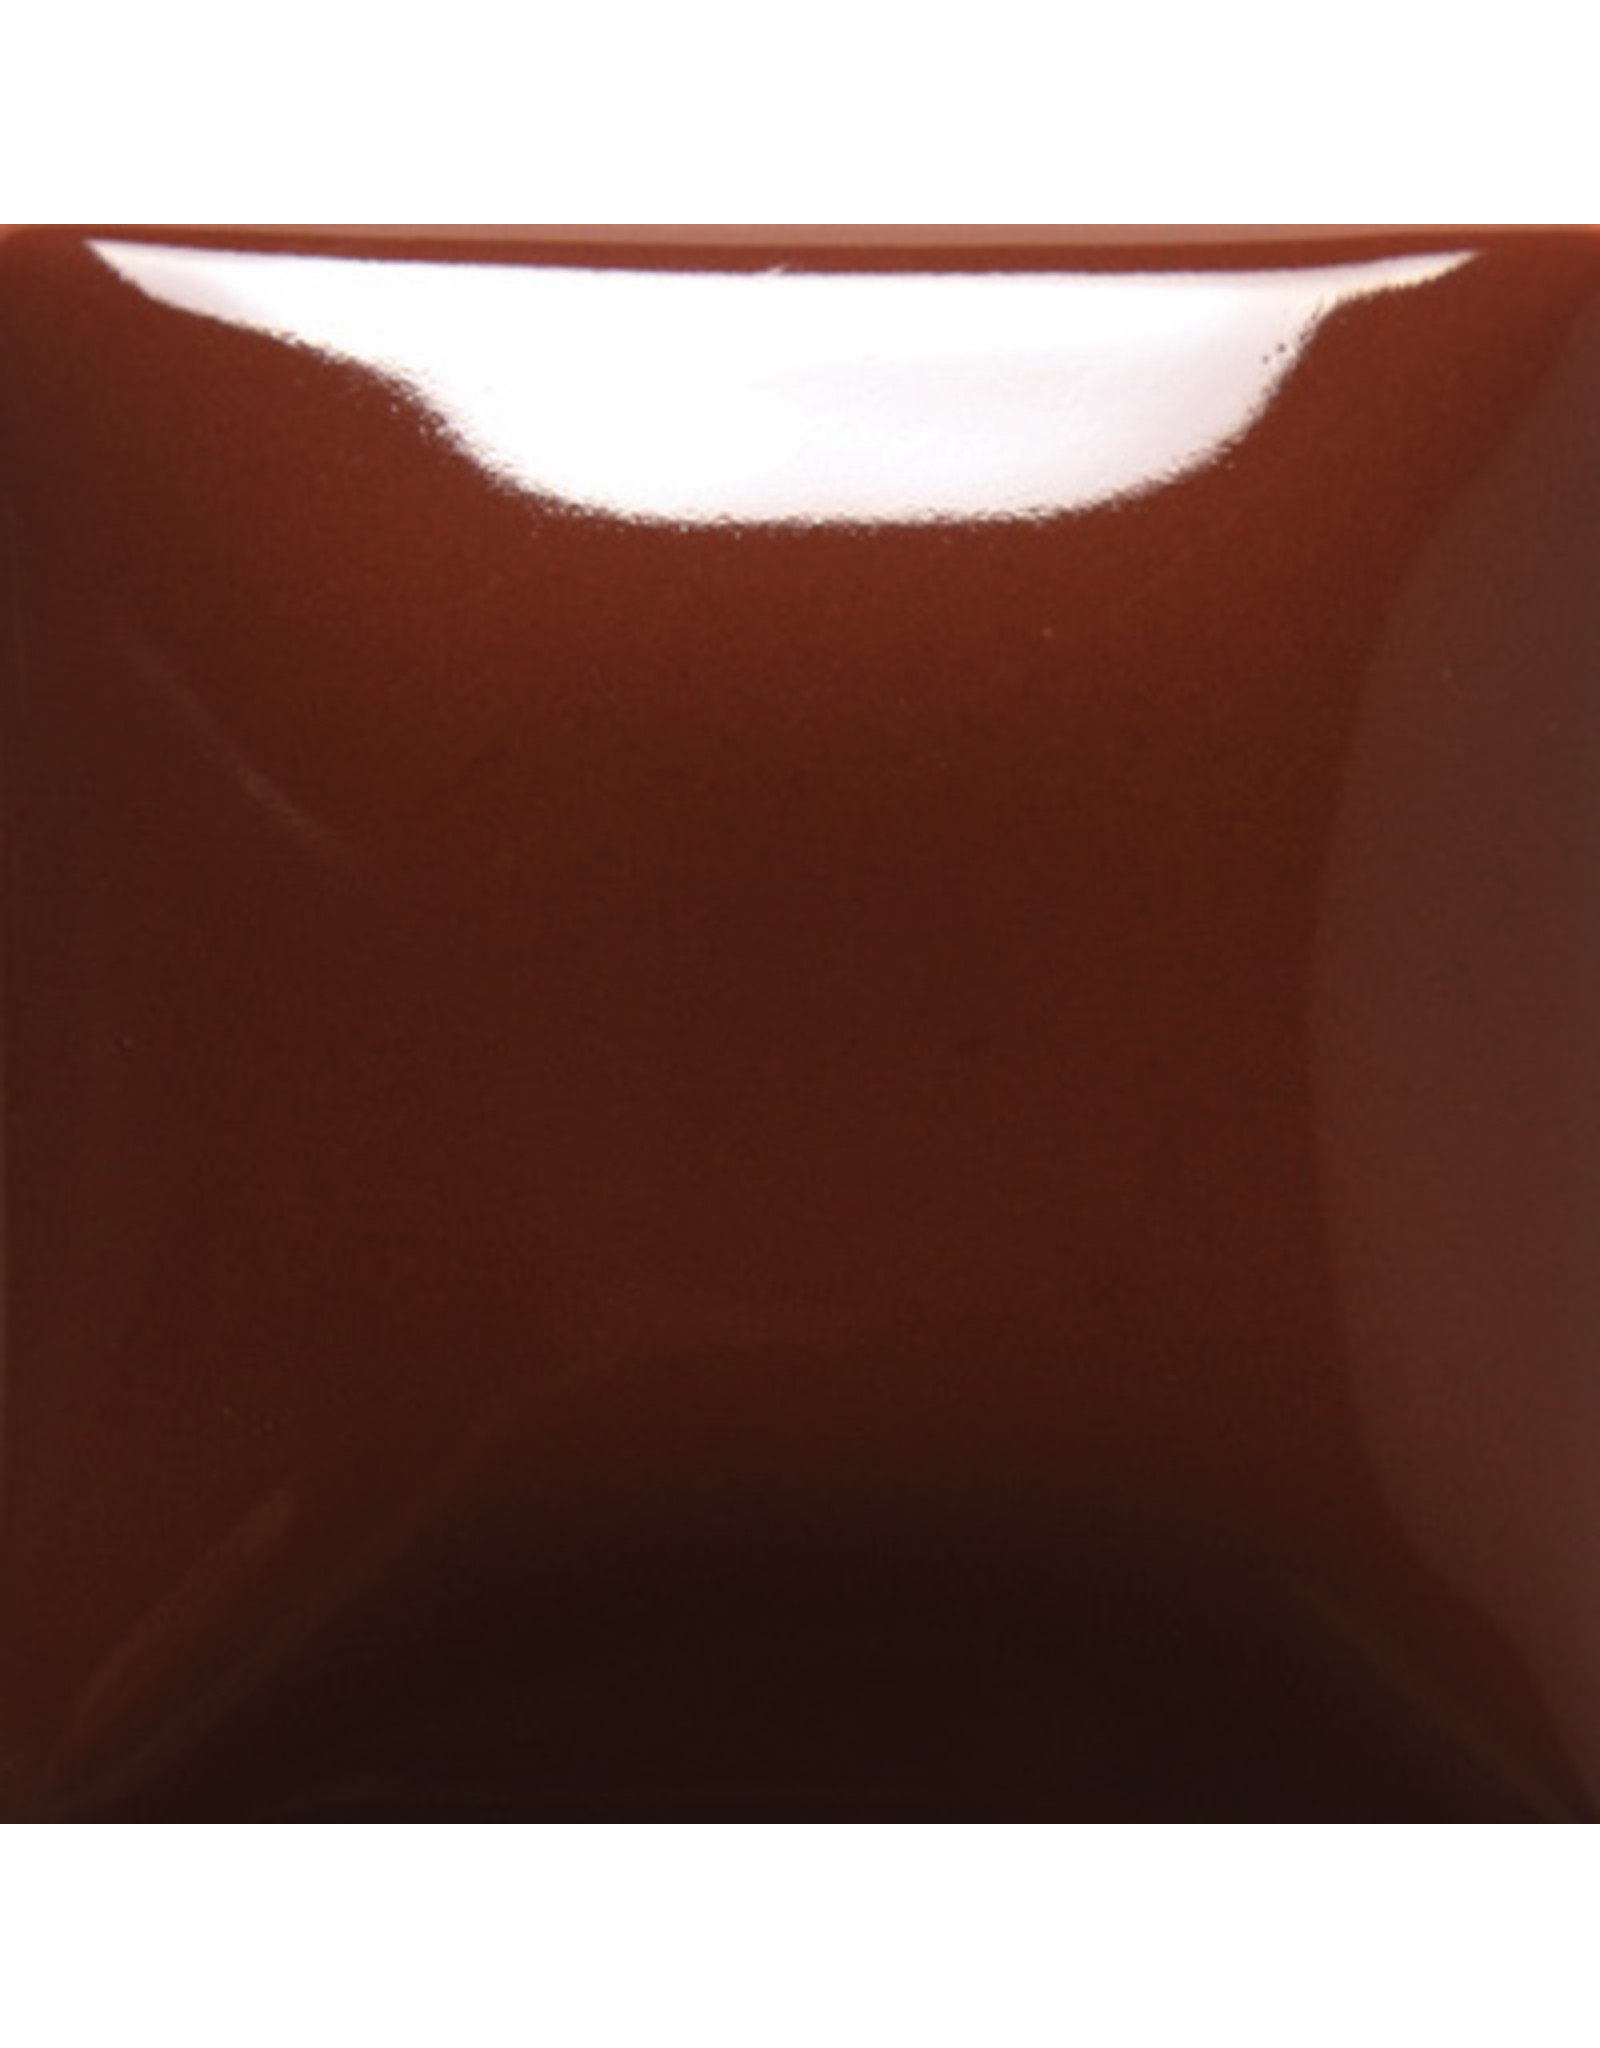 Mayco Mayco Foundations Rich Chocolate 473ml